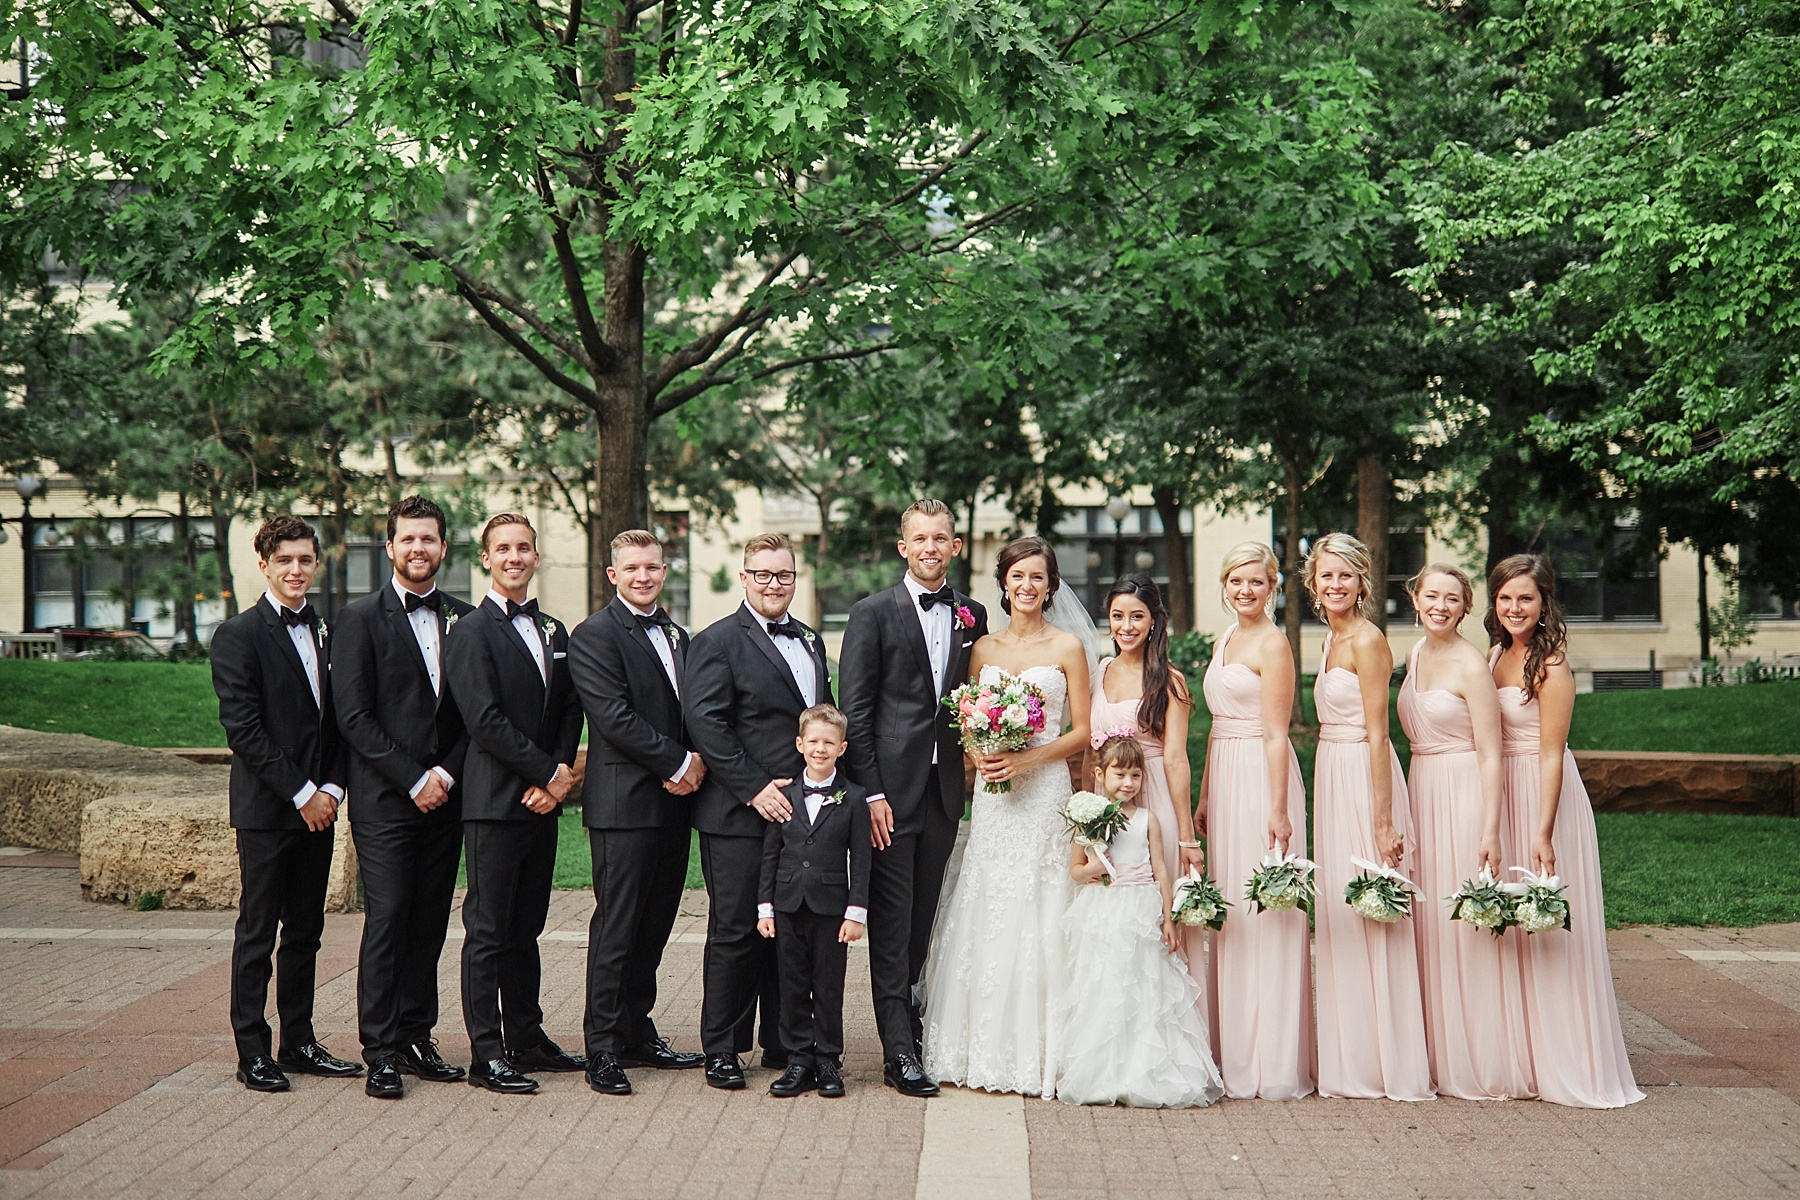 ABULAE-Wedding-Saint-paul-MN-Josh-Sofia-Wedding-Mears-Park_0786.jpg